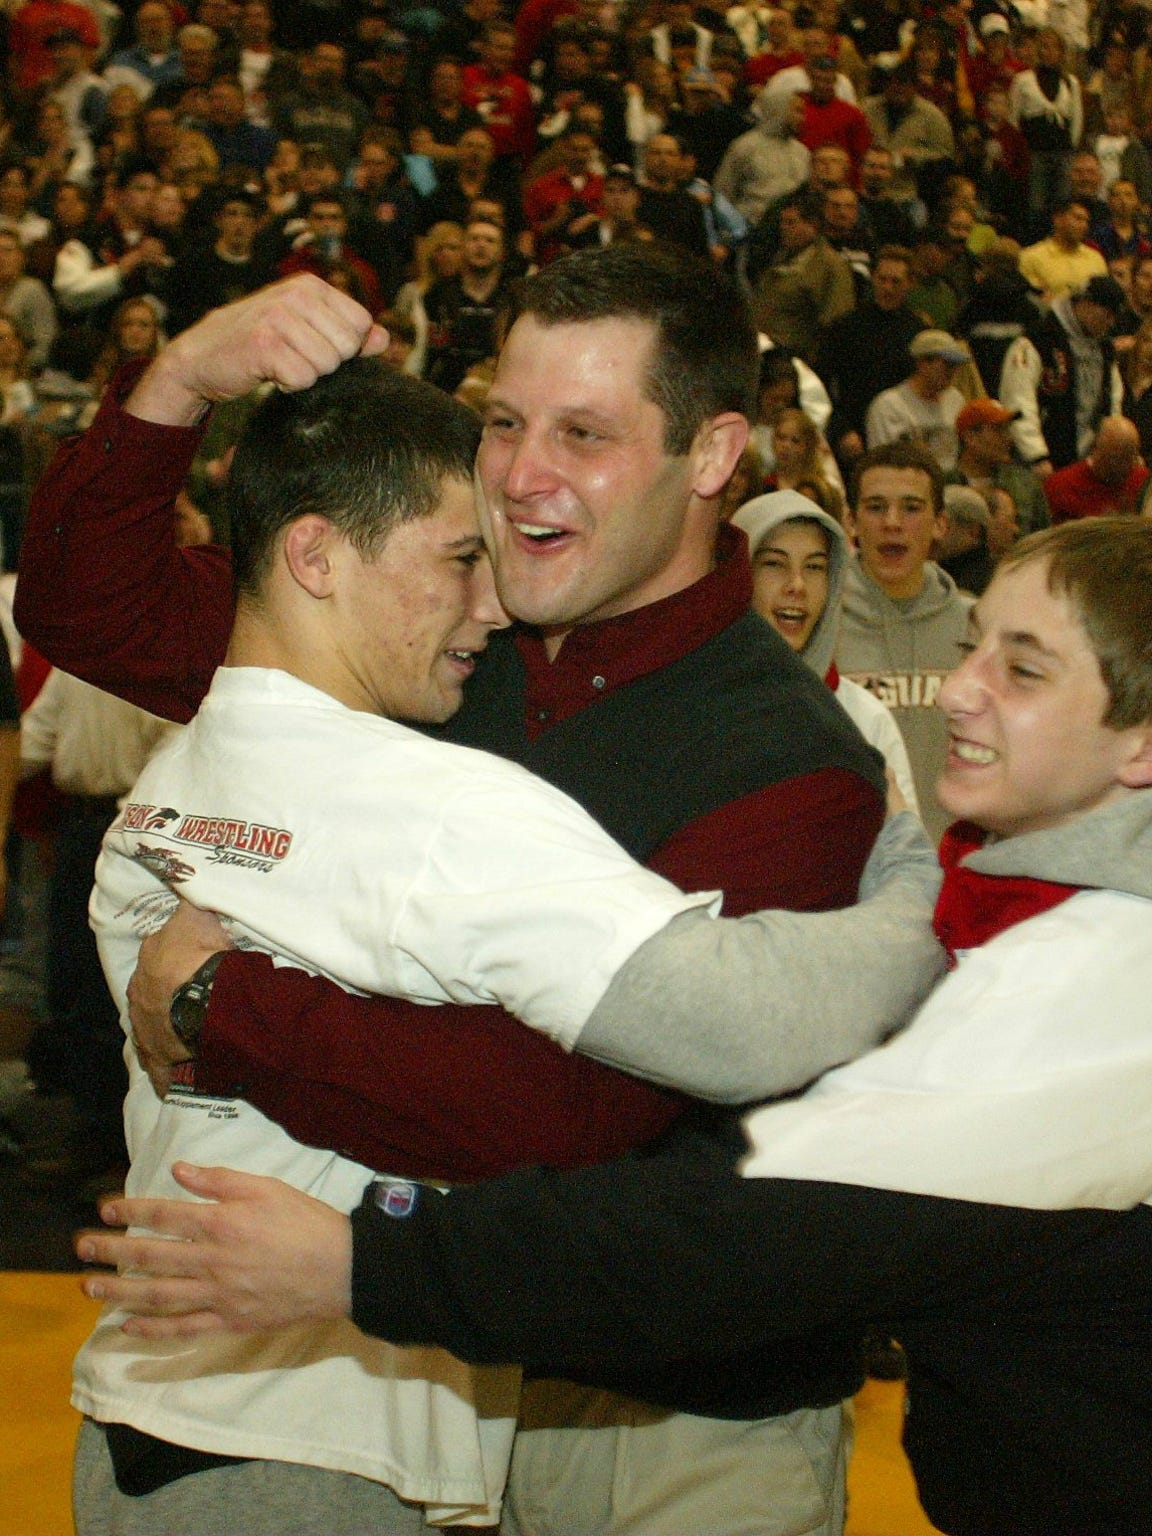 Scott Goodale and Scott Winston had many moments to